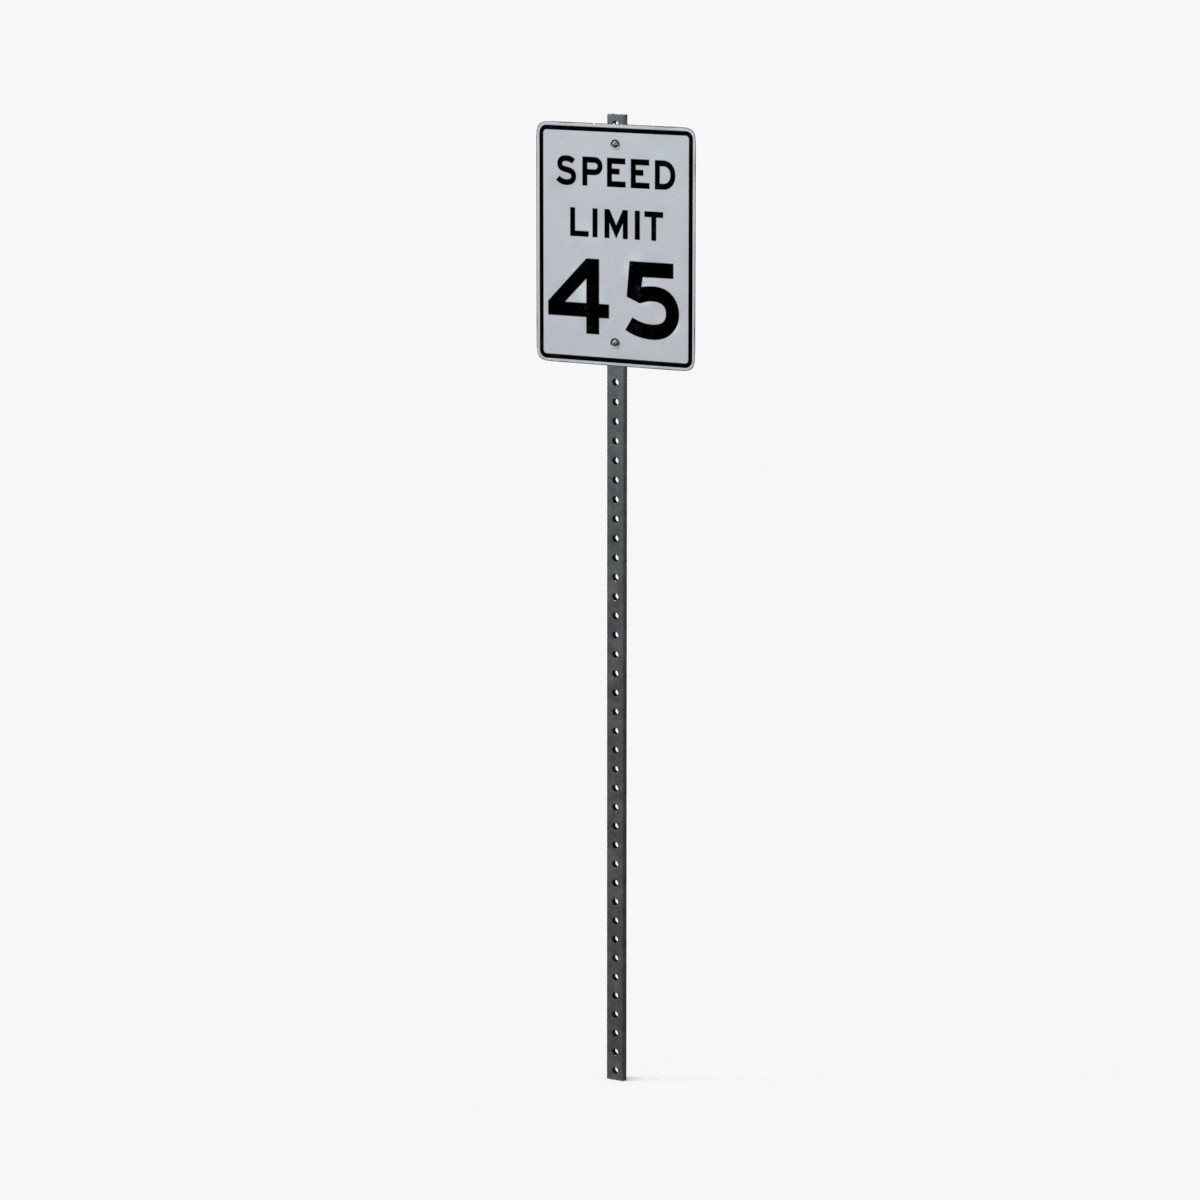 speed limit sign 45 3d model